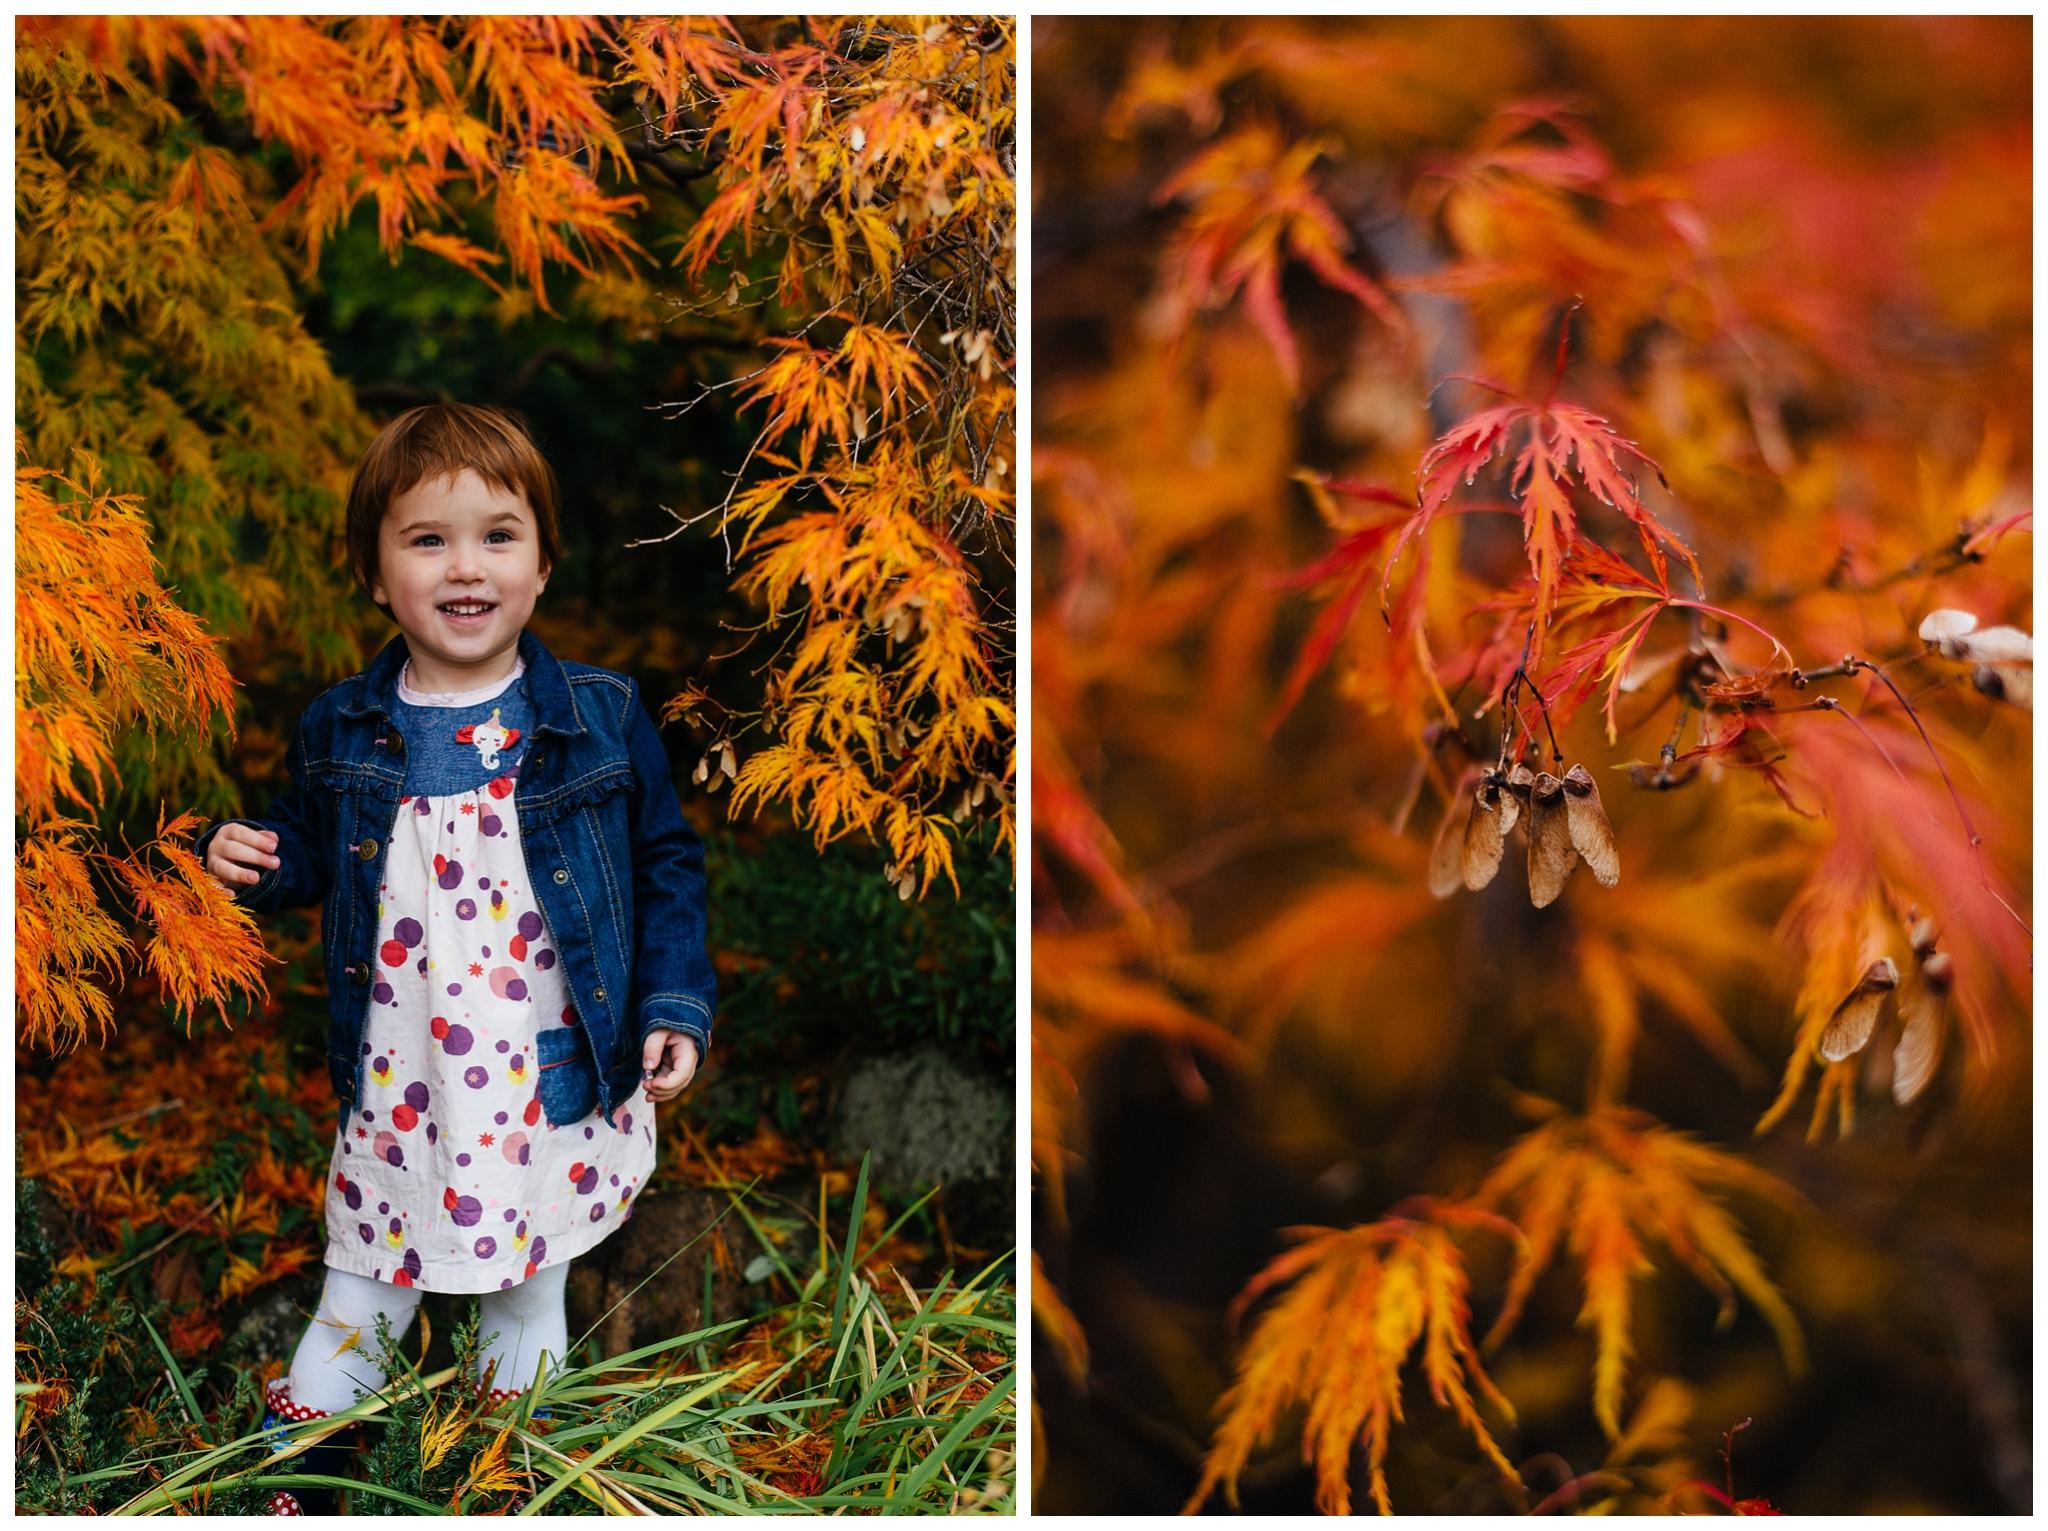 Autumn-family-portraits-birmingham-photographer_0039.jpg